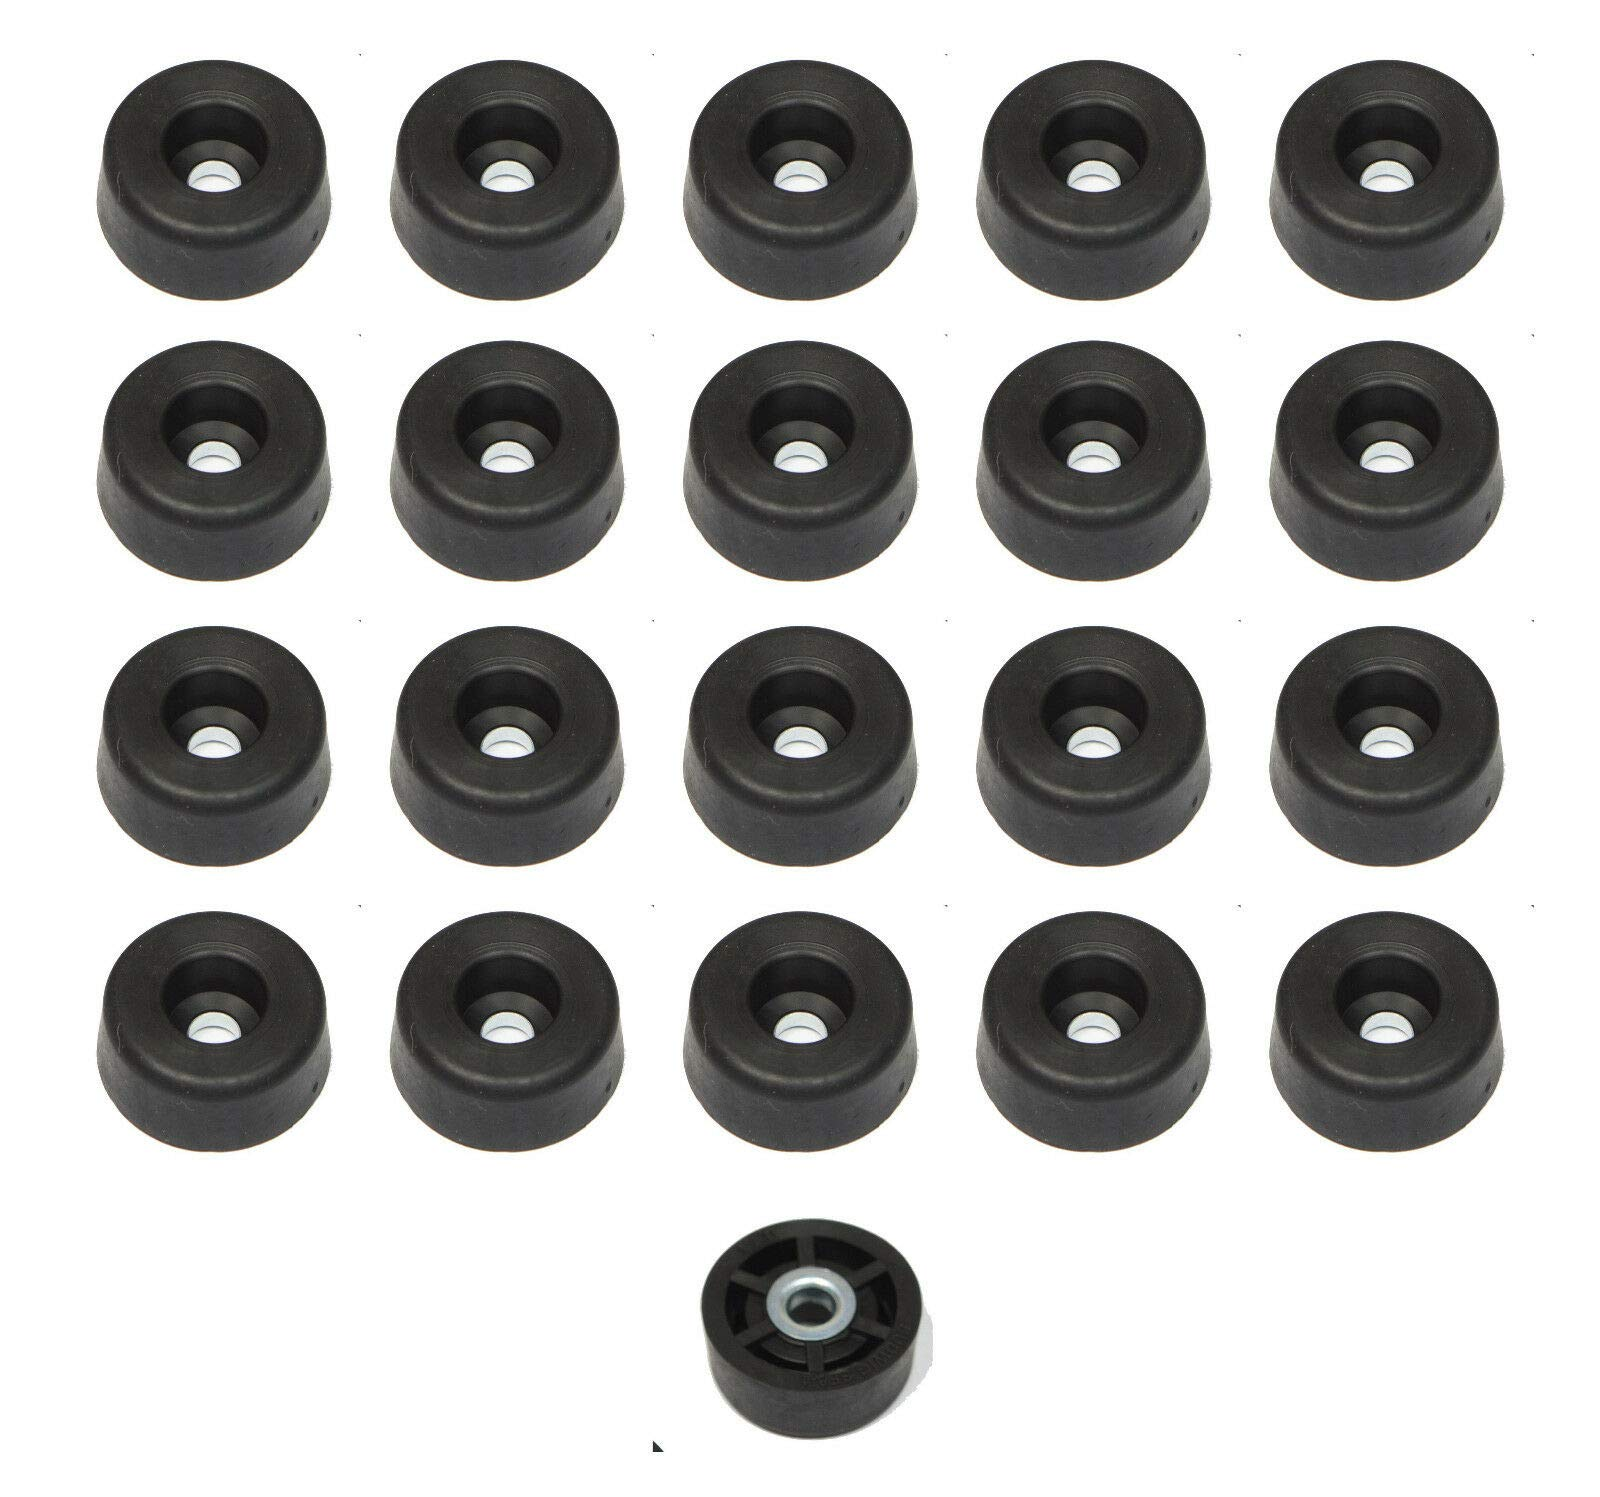 20 Medium Round #2 Rubber FEET .375 H X .875 W - Radio Made in USA- Free S&H